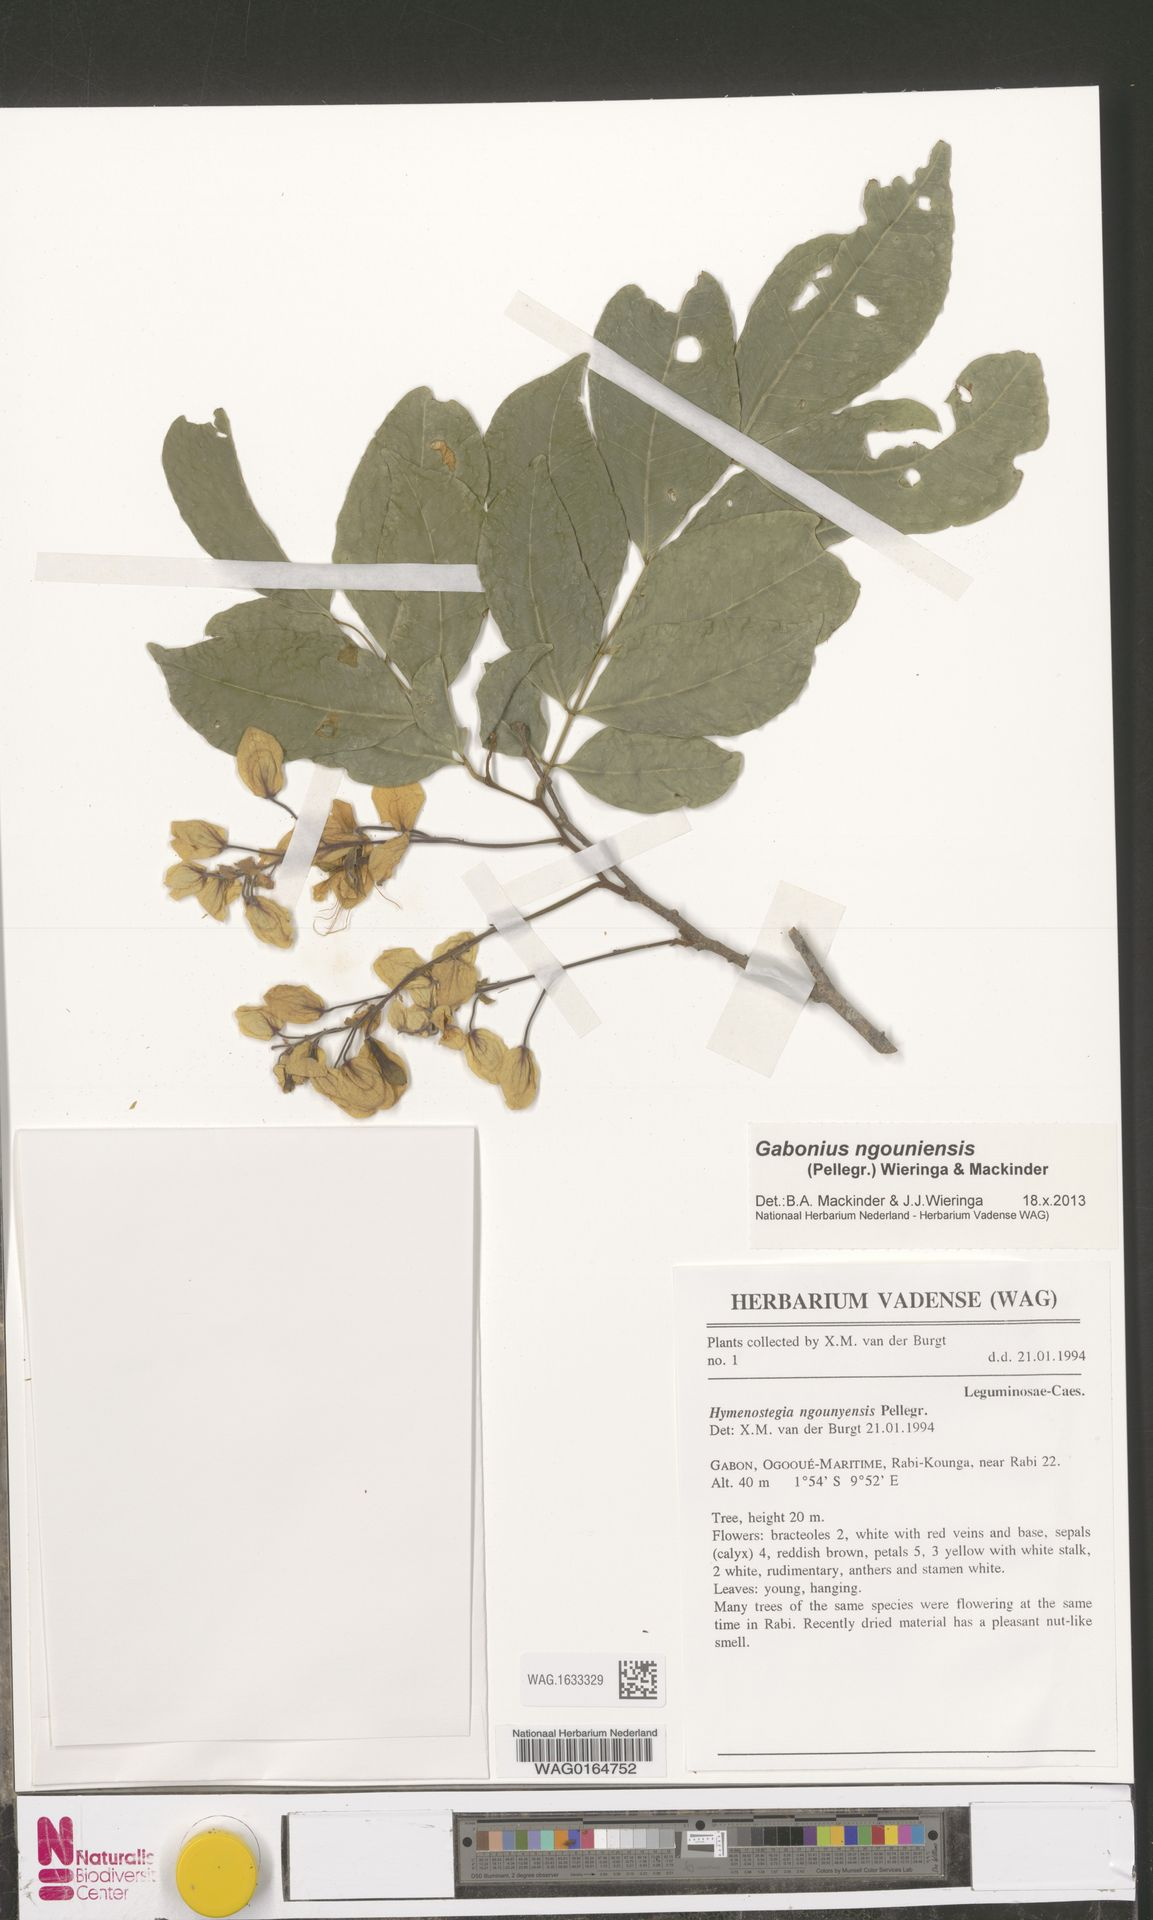 WAG.1633329 | Gabonius ngouniensis (Pellegr.) Wieringa & Mackinder